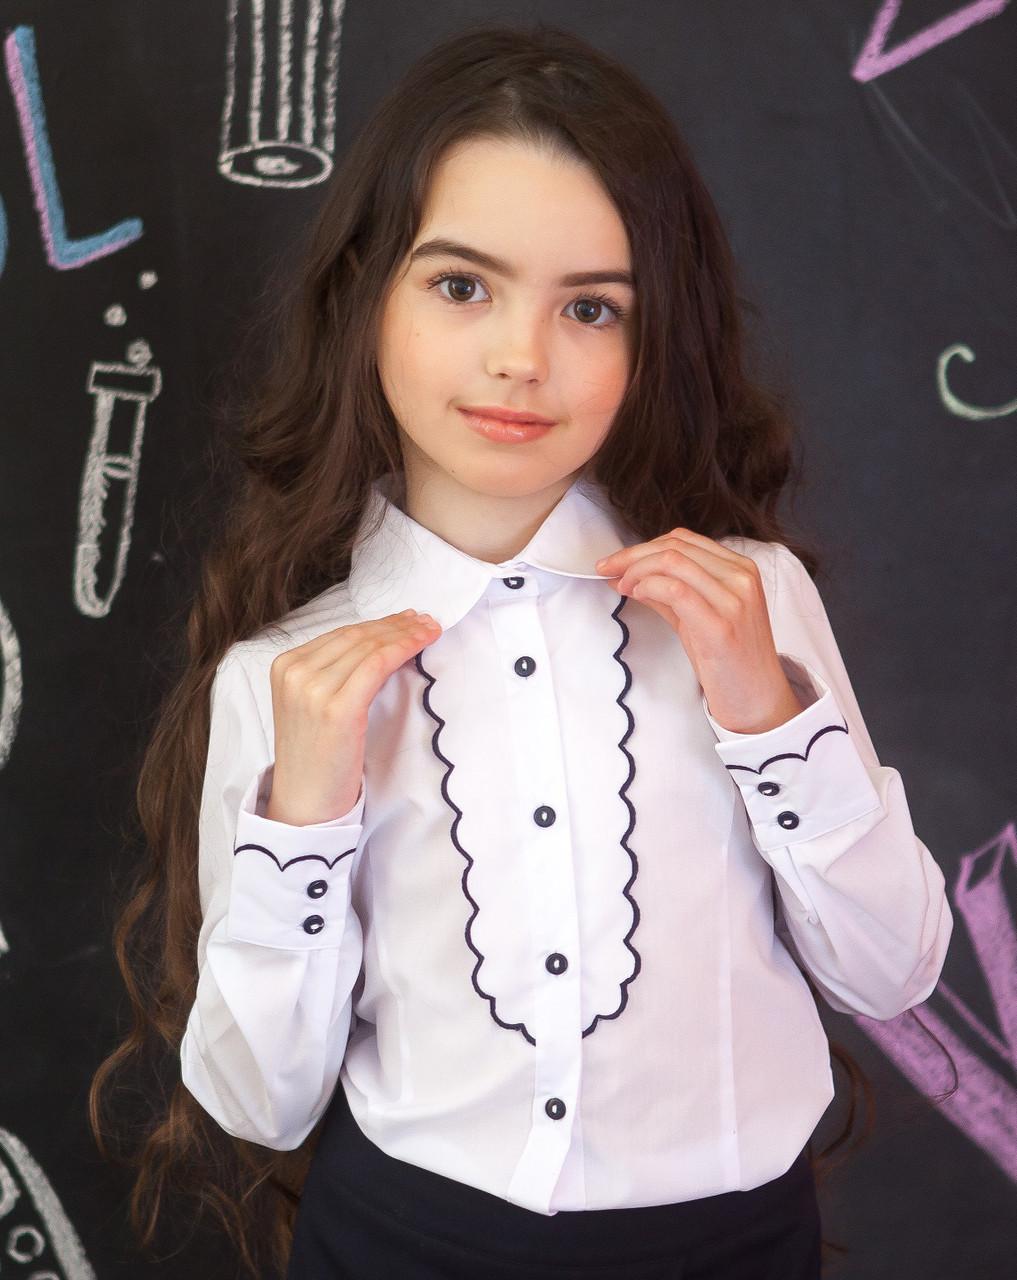 Школьная блузка Свит блуз  мод. 5010д р.134